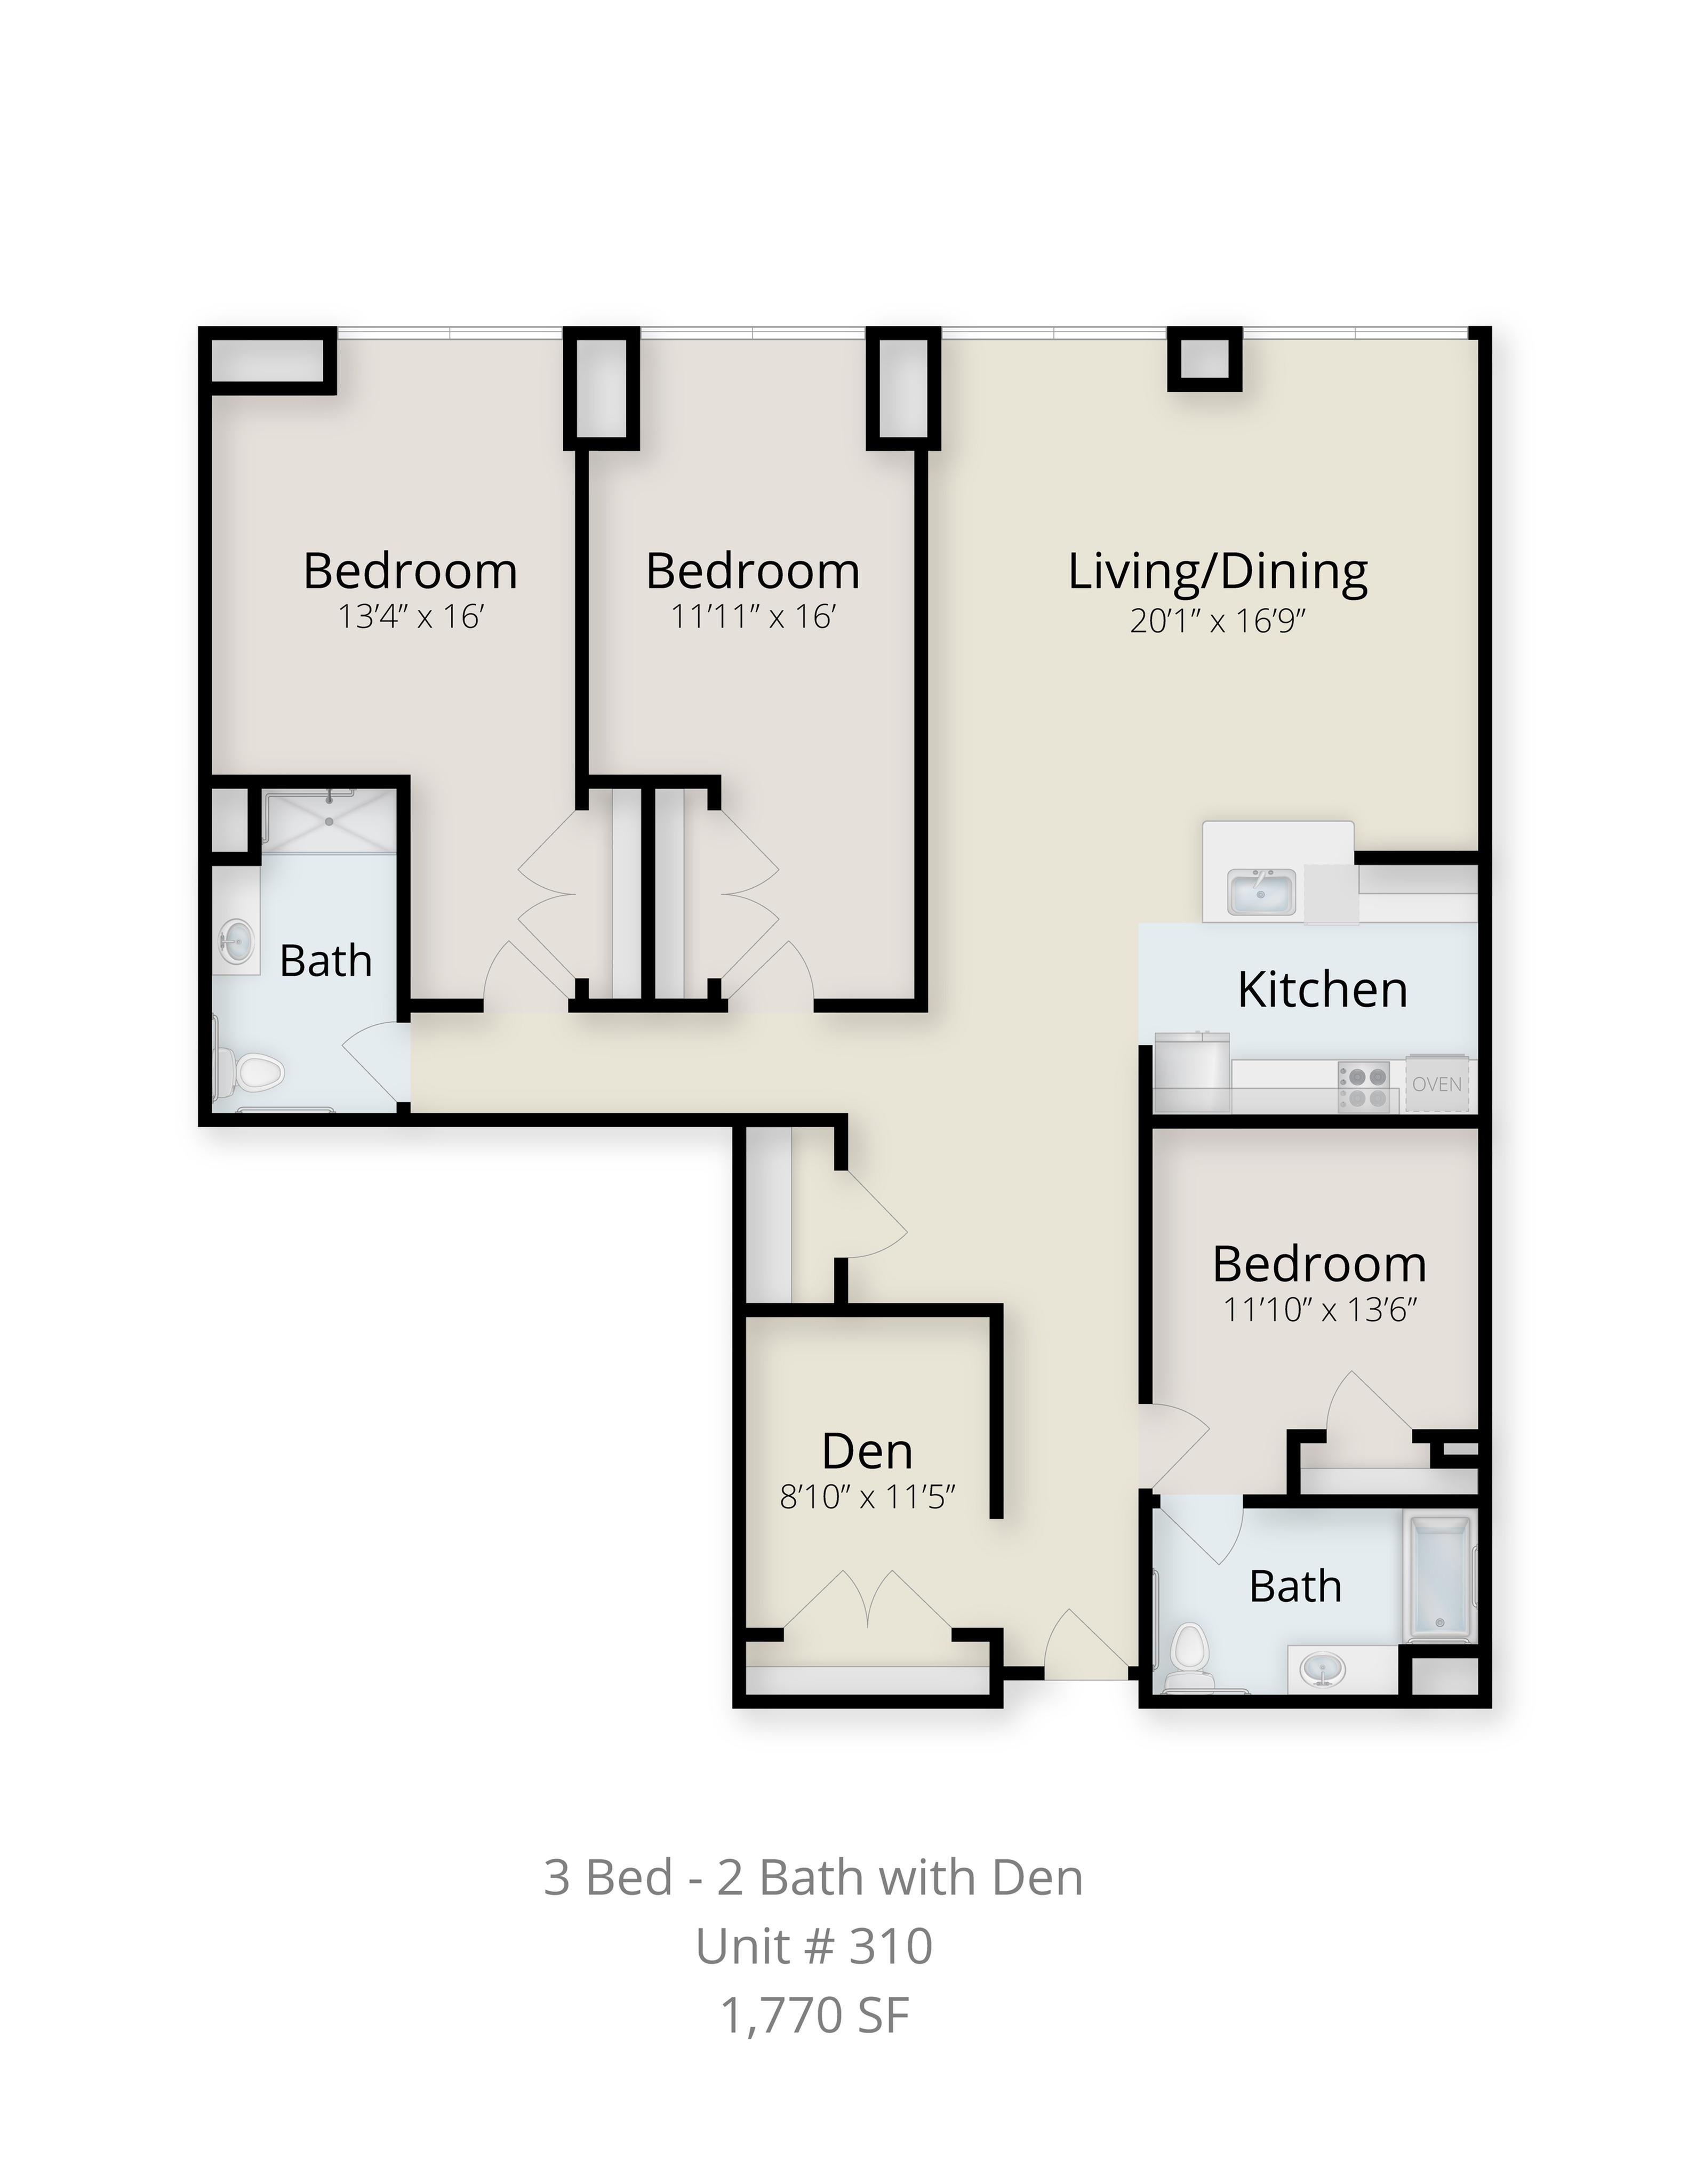 3 Bed 2 Bath Apartment In Fitchburg Ma Yarn Works